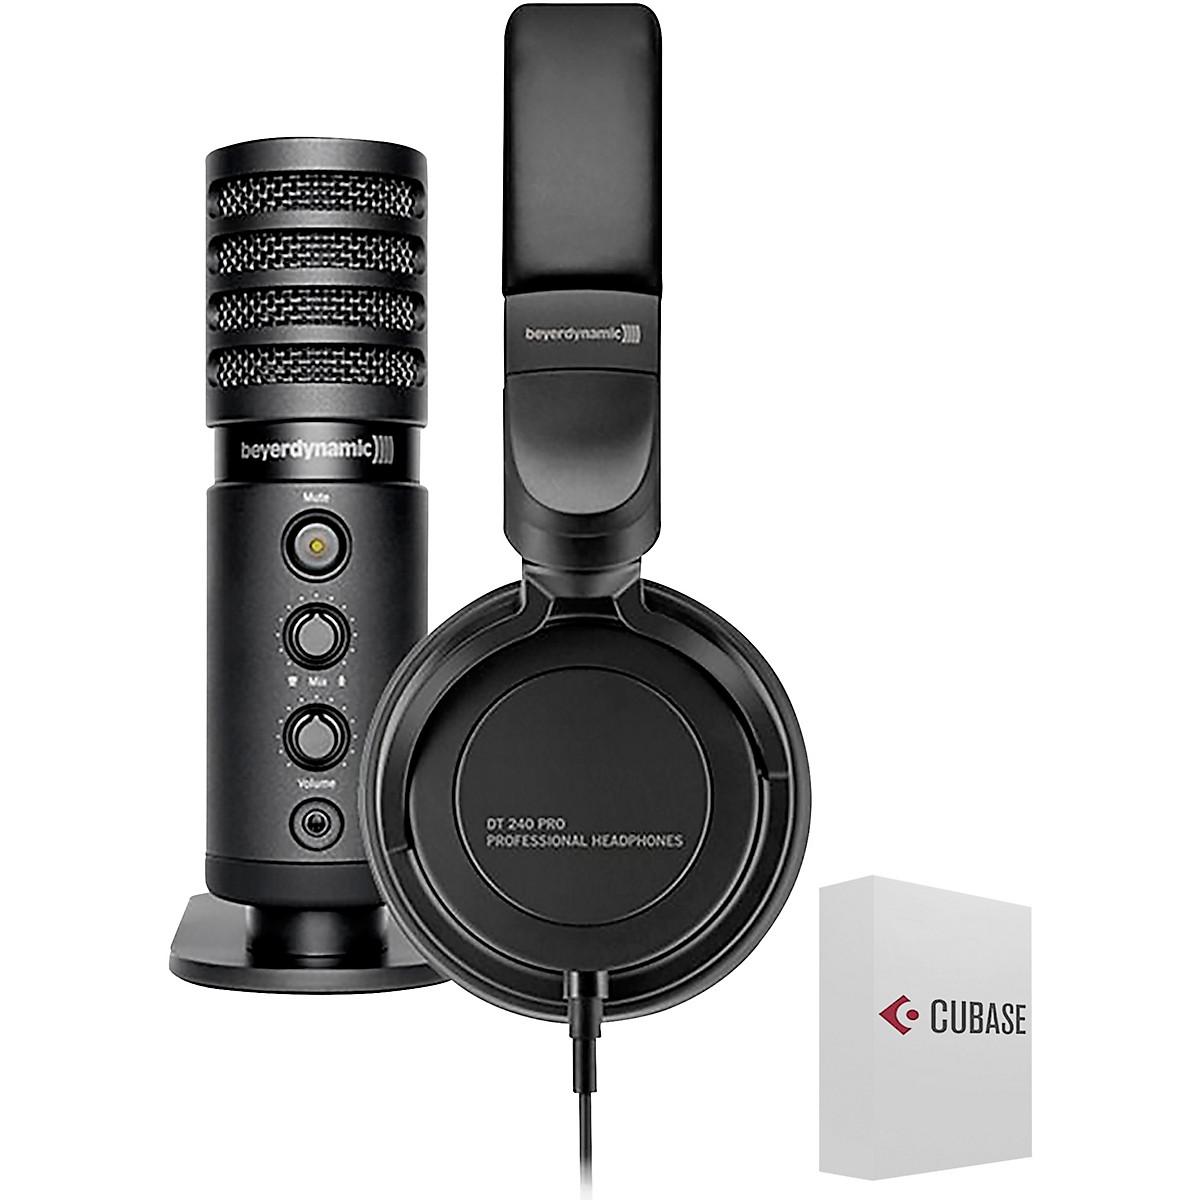 Beyerdynamic Creator 24 with DT 240 Pro Headphones and FOX USB